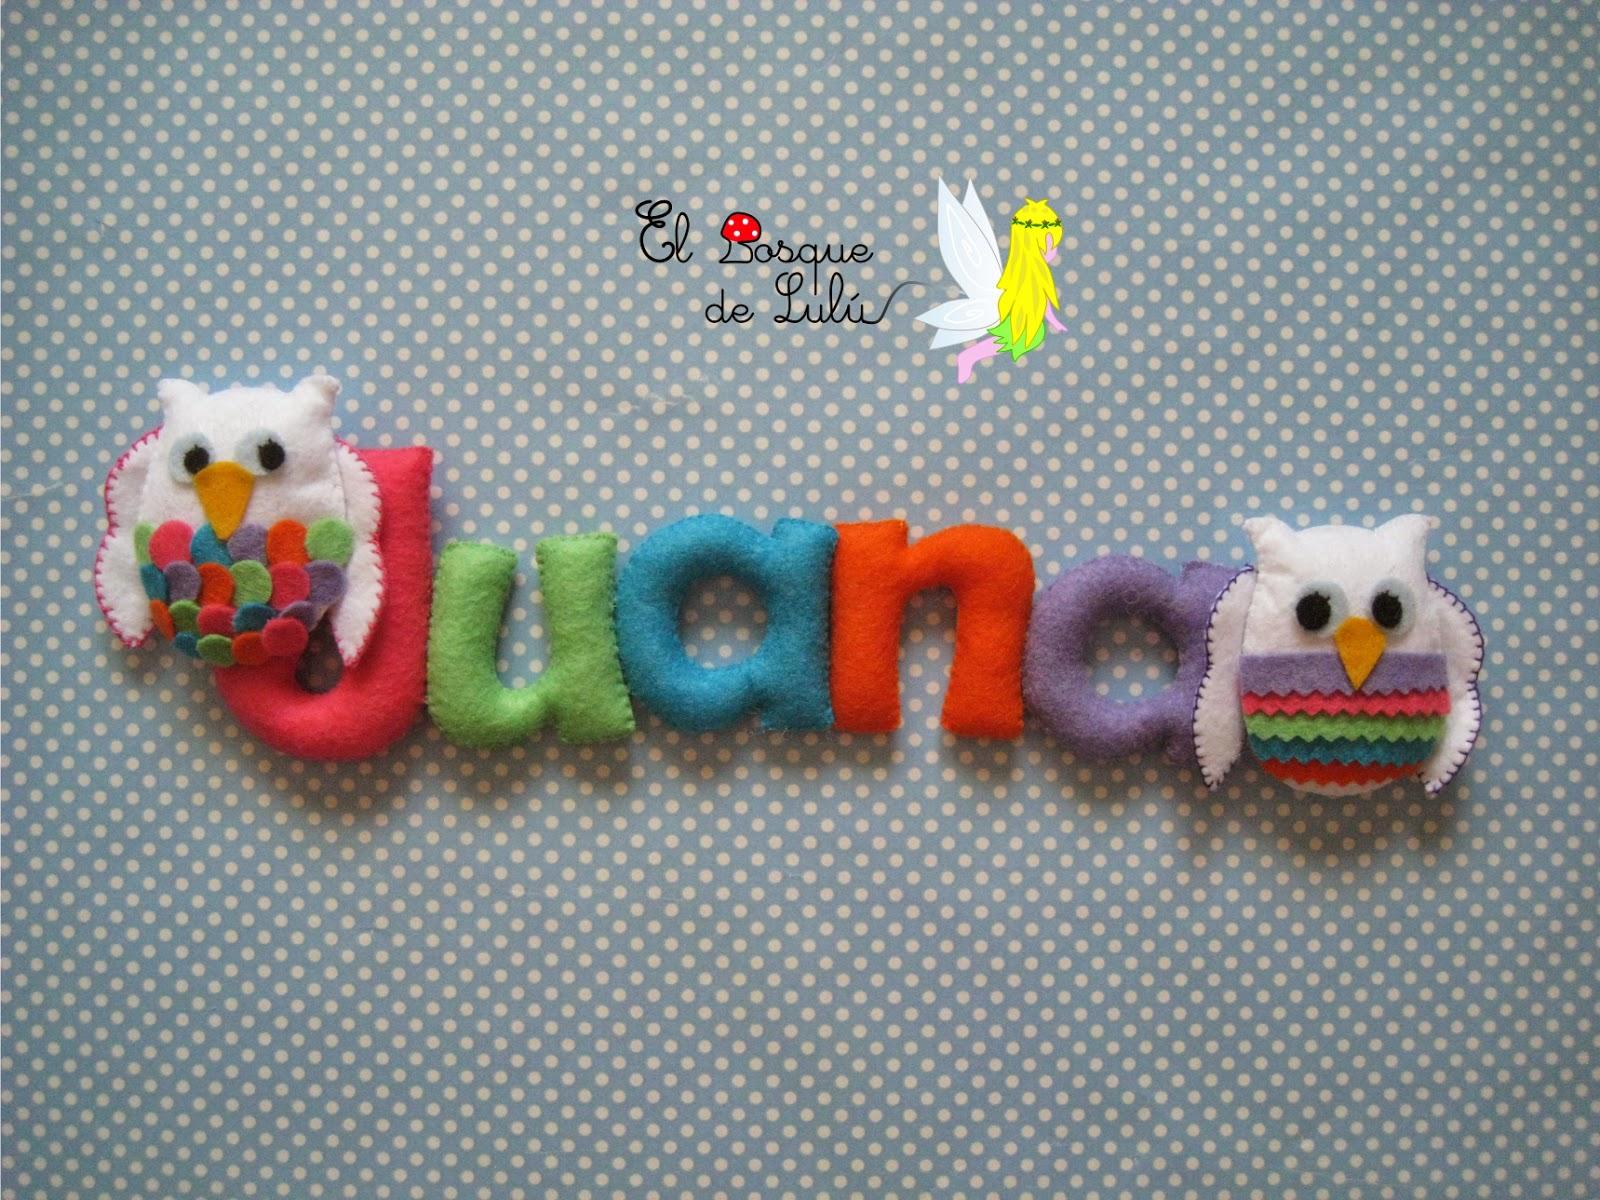 nombre-fieltro-decorativo-infantil-regalo-nacimiento-Juana-name-banner